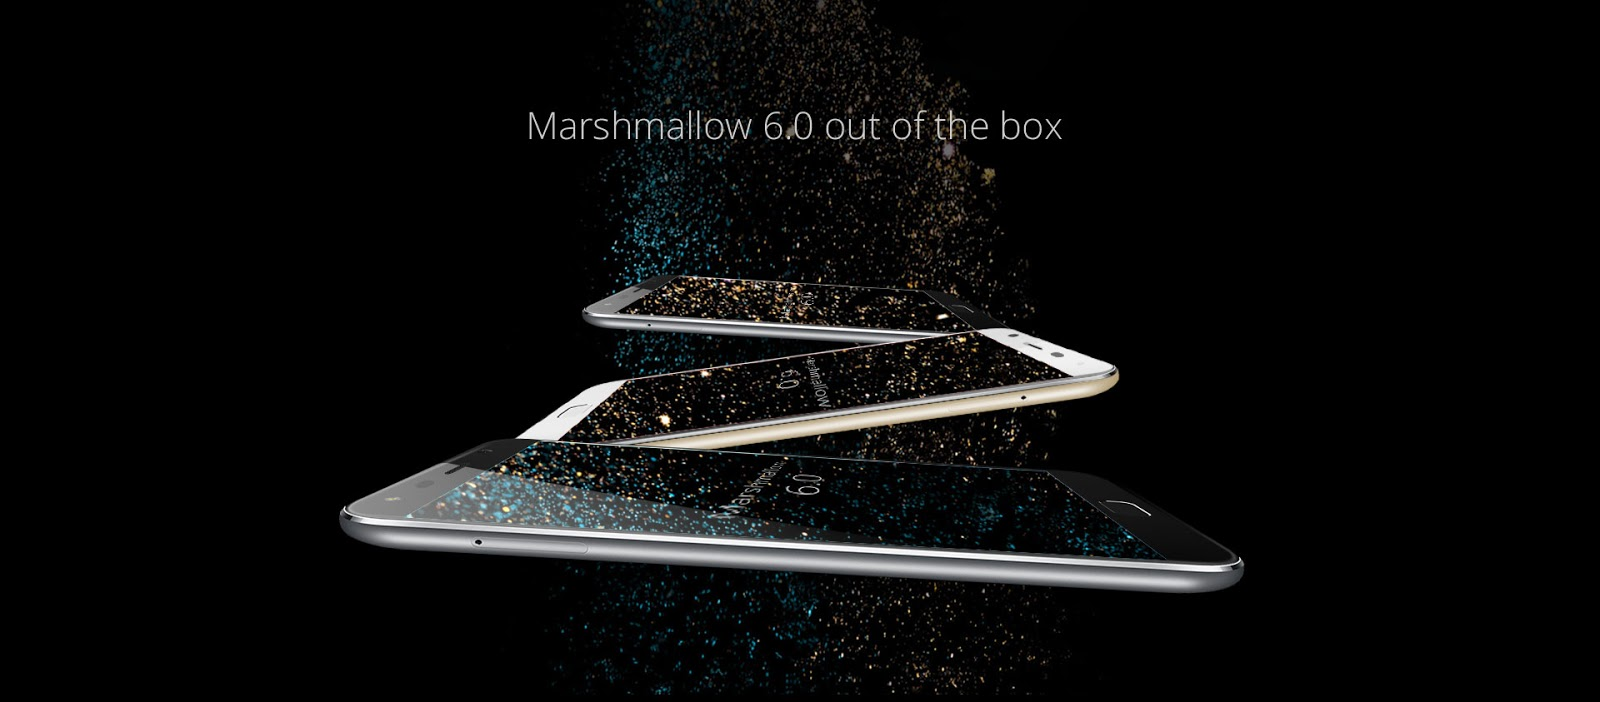 Androïd 6.0 Marshmallow